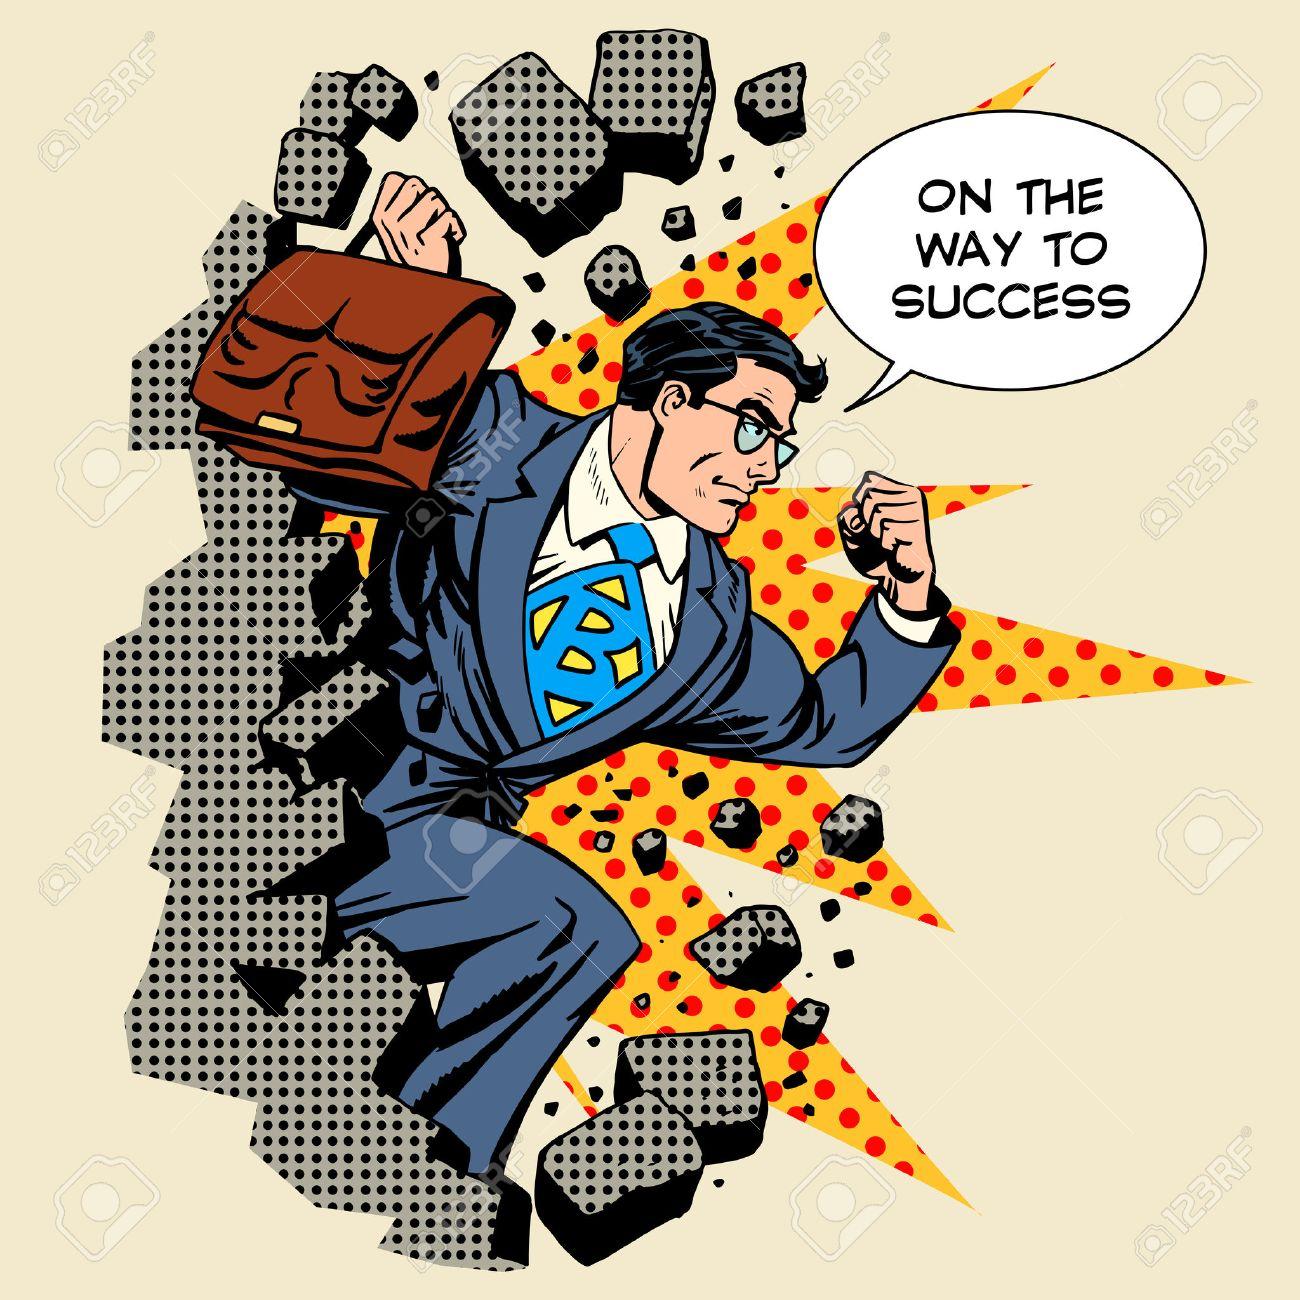 Business breakthrough success businessman hero breaks through the wall retro style pop art - 45630592